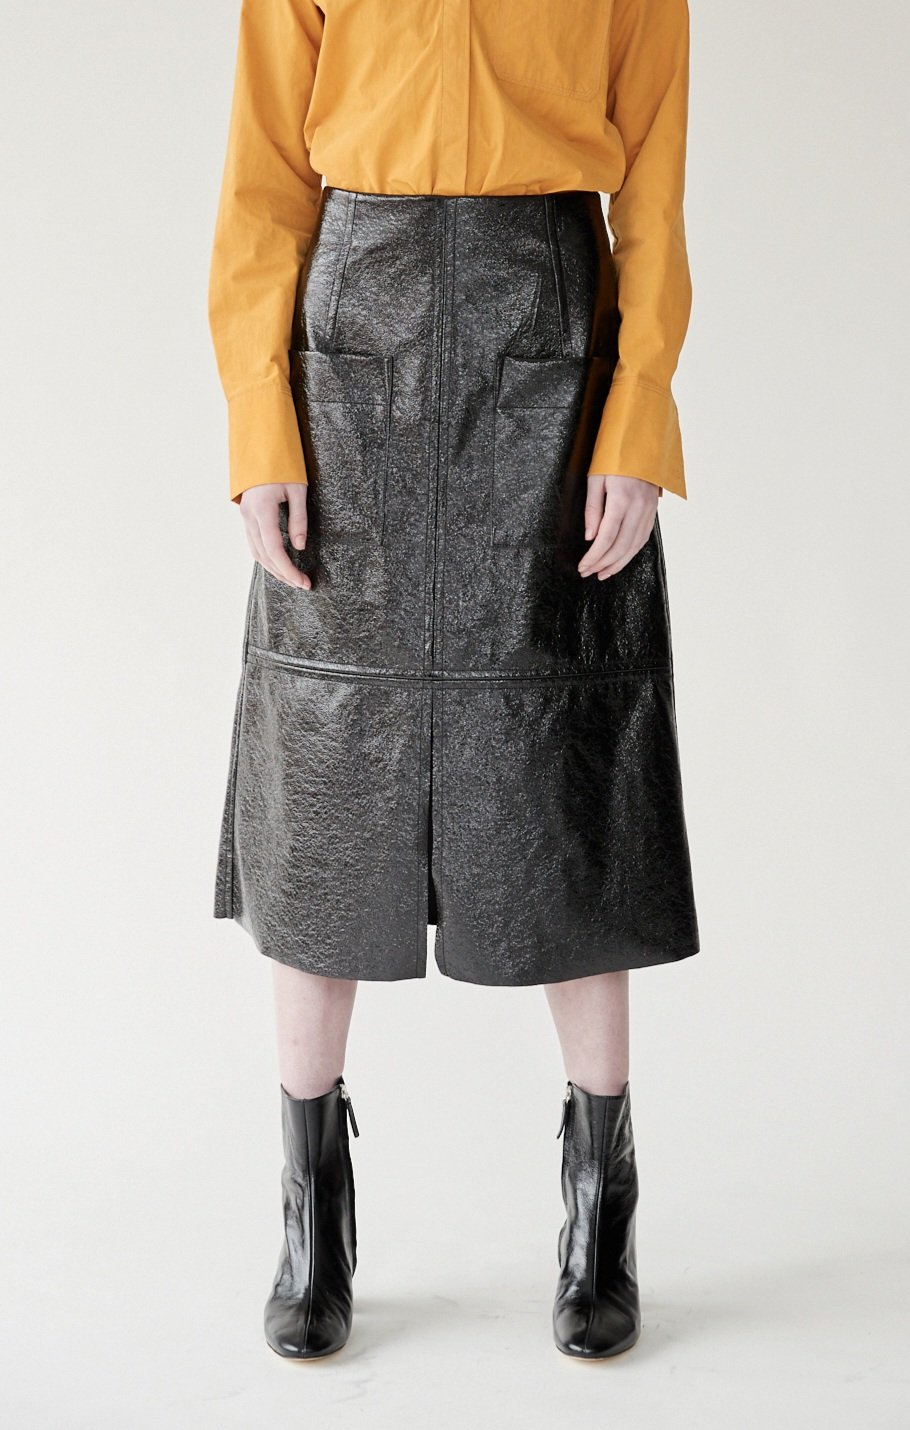 a79ec093e3 PATENT FAUX LEATHER SKIRT - BLACK — MIJEONG PARK - LA based womenswear label